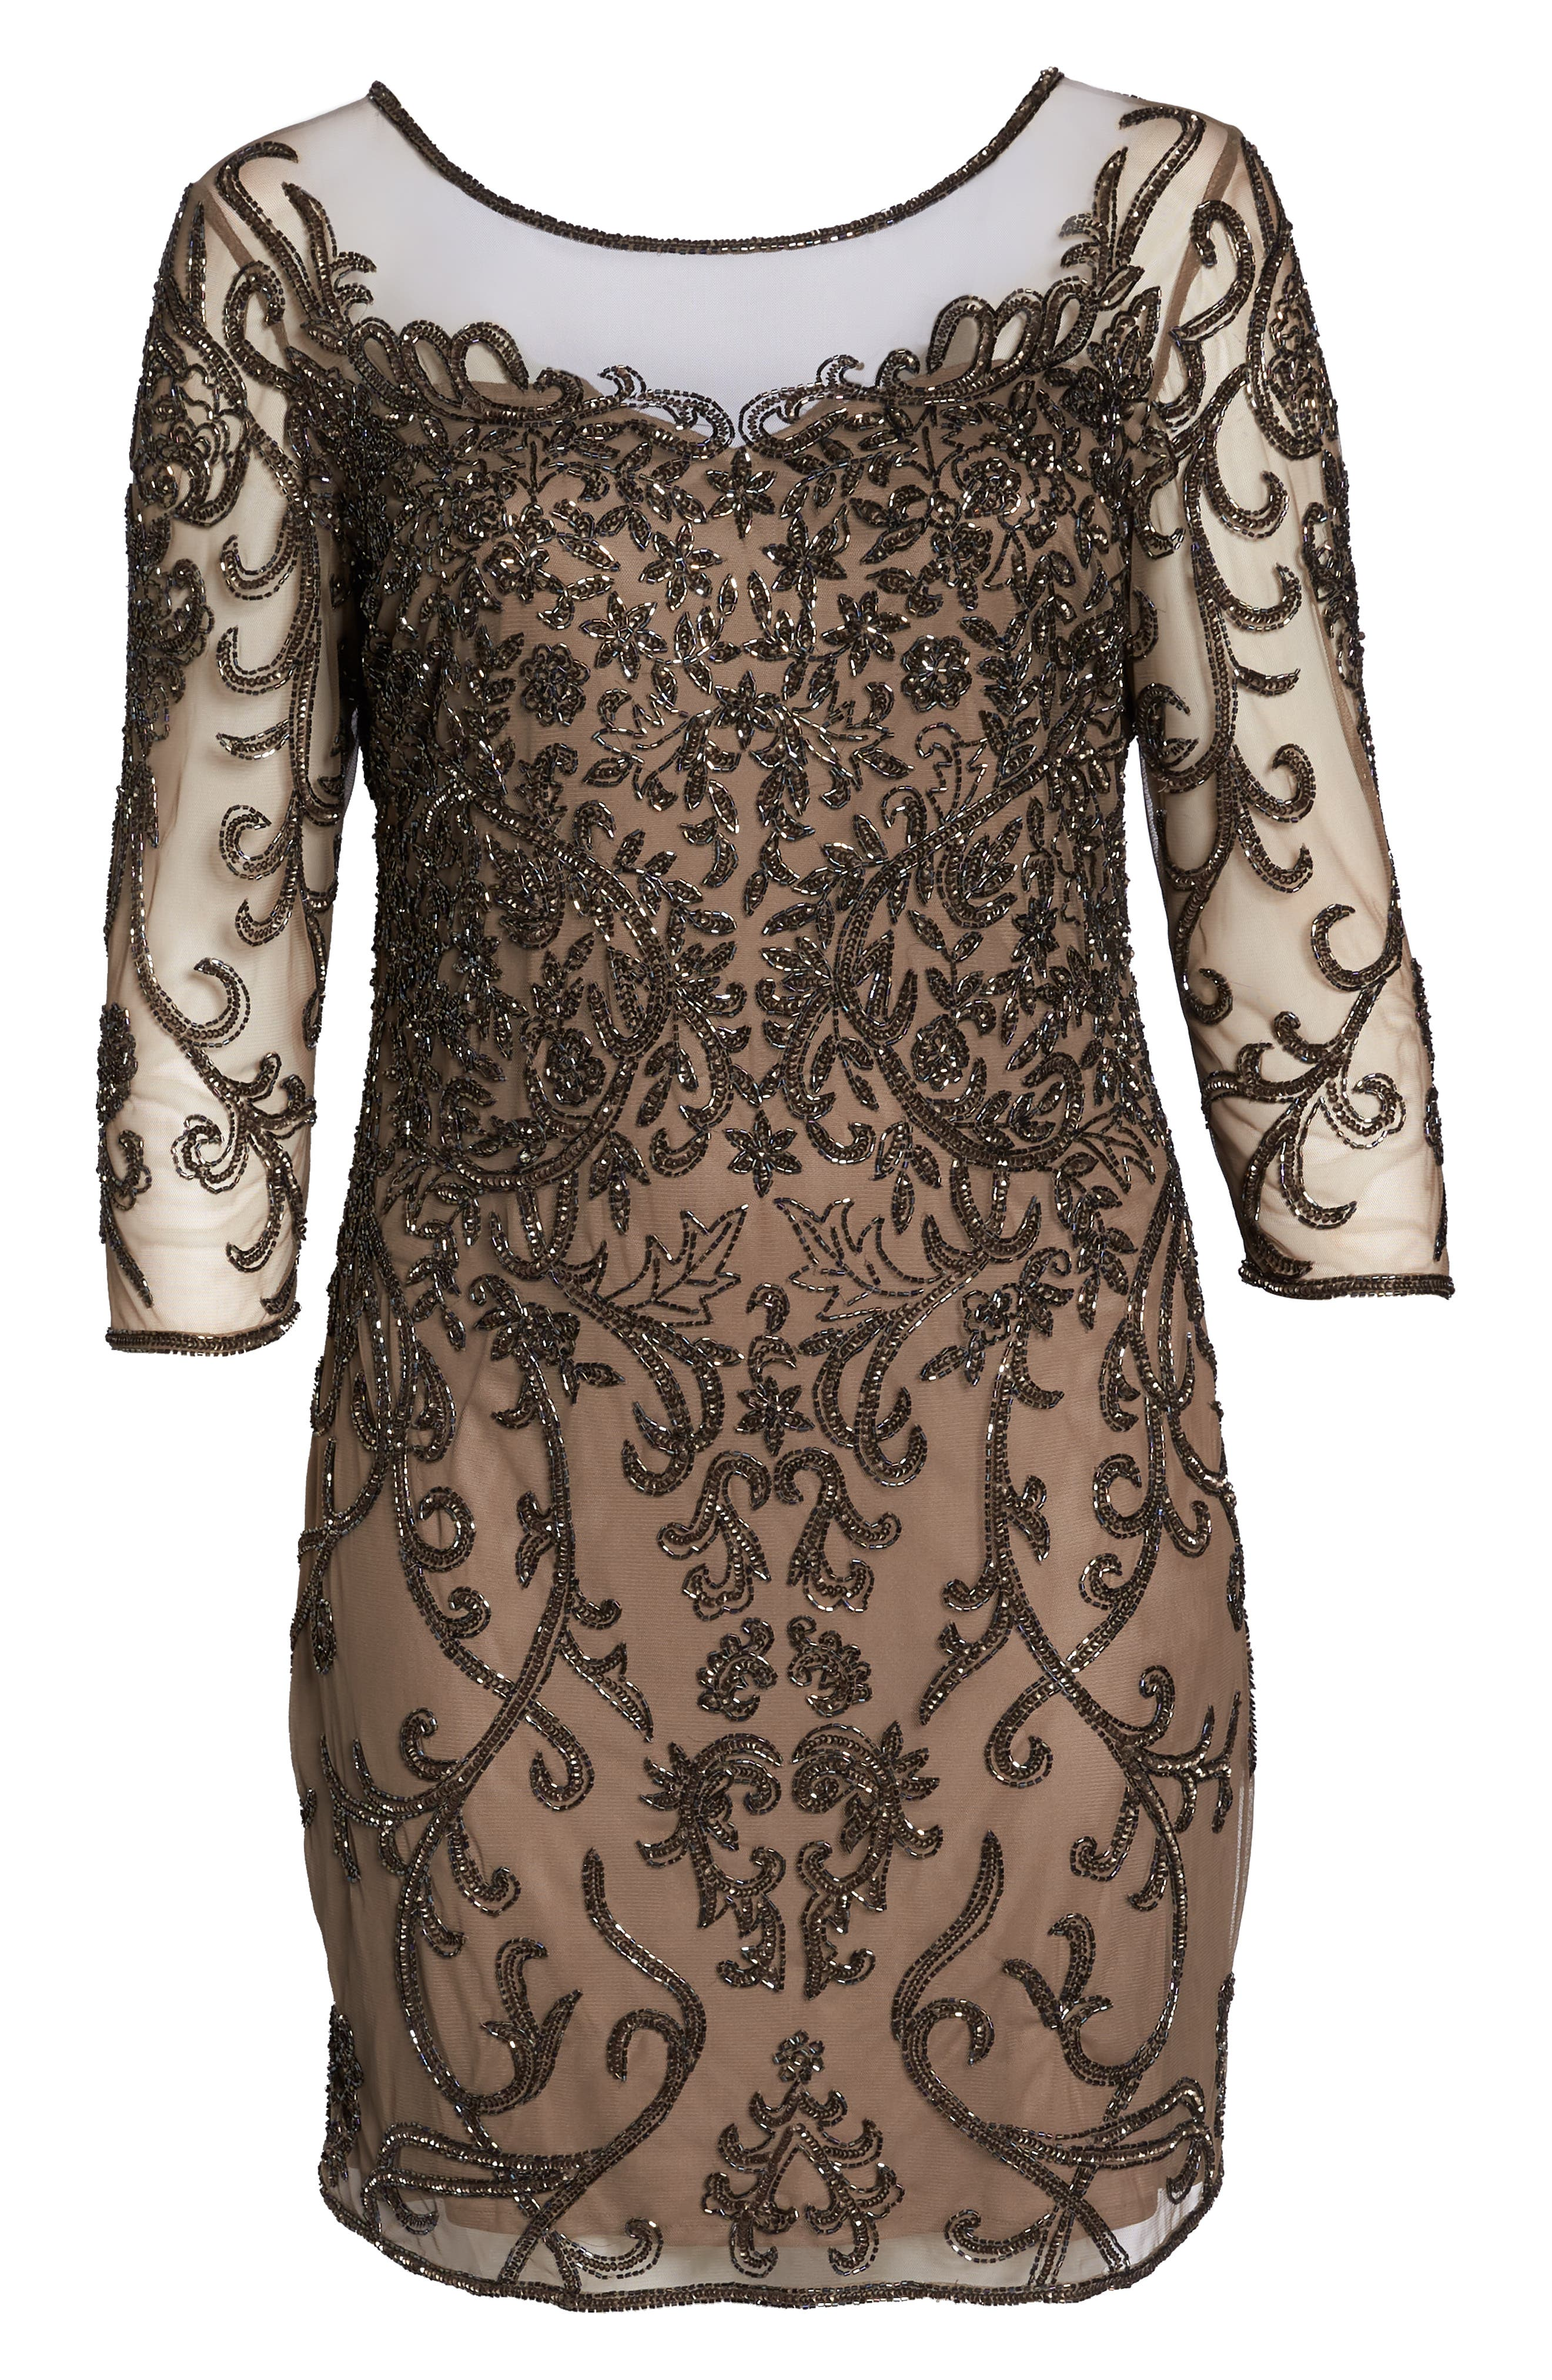 Illusion Sleeve Beaded Sheath Dress,                             Alternate thumbnail 7, color,                             BROWN/ GOLD